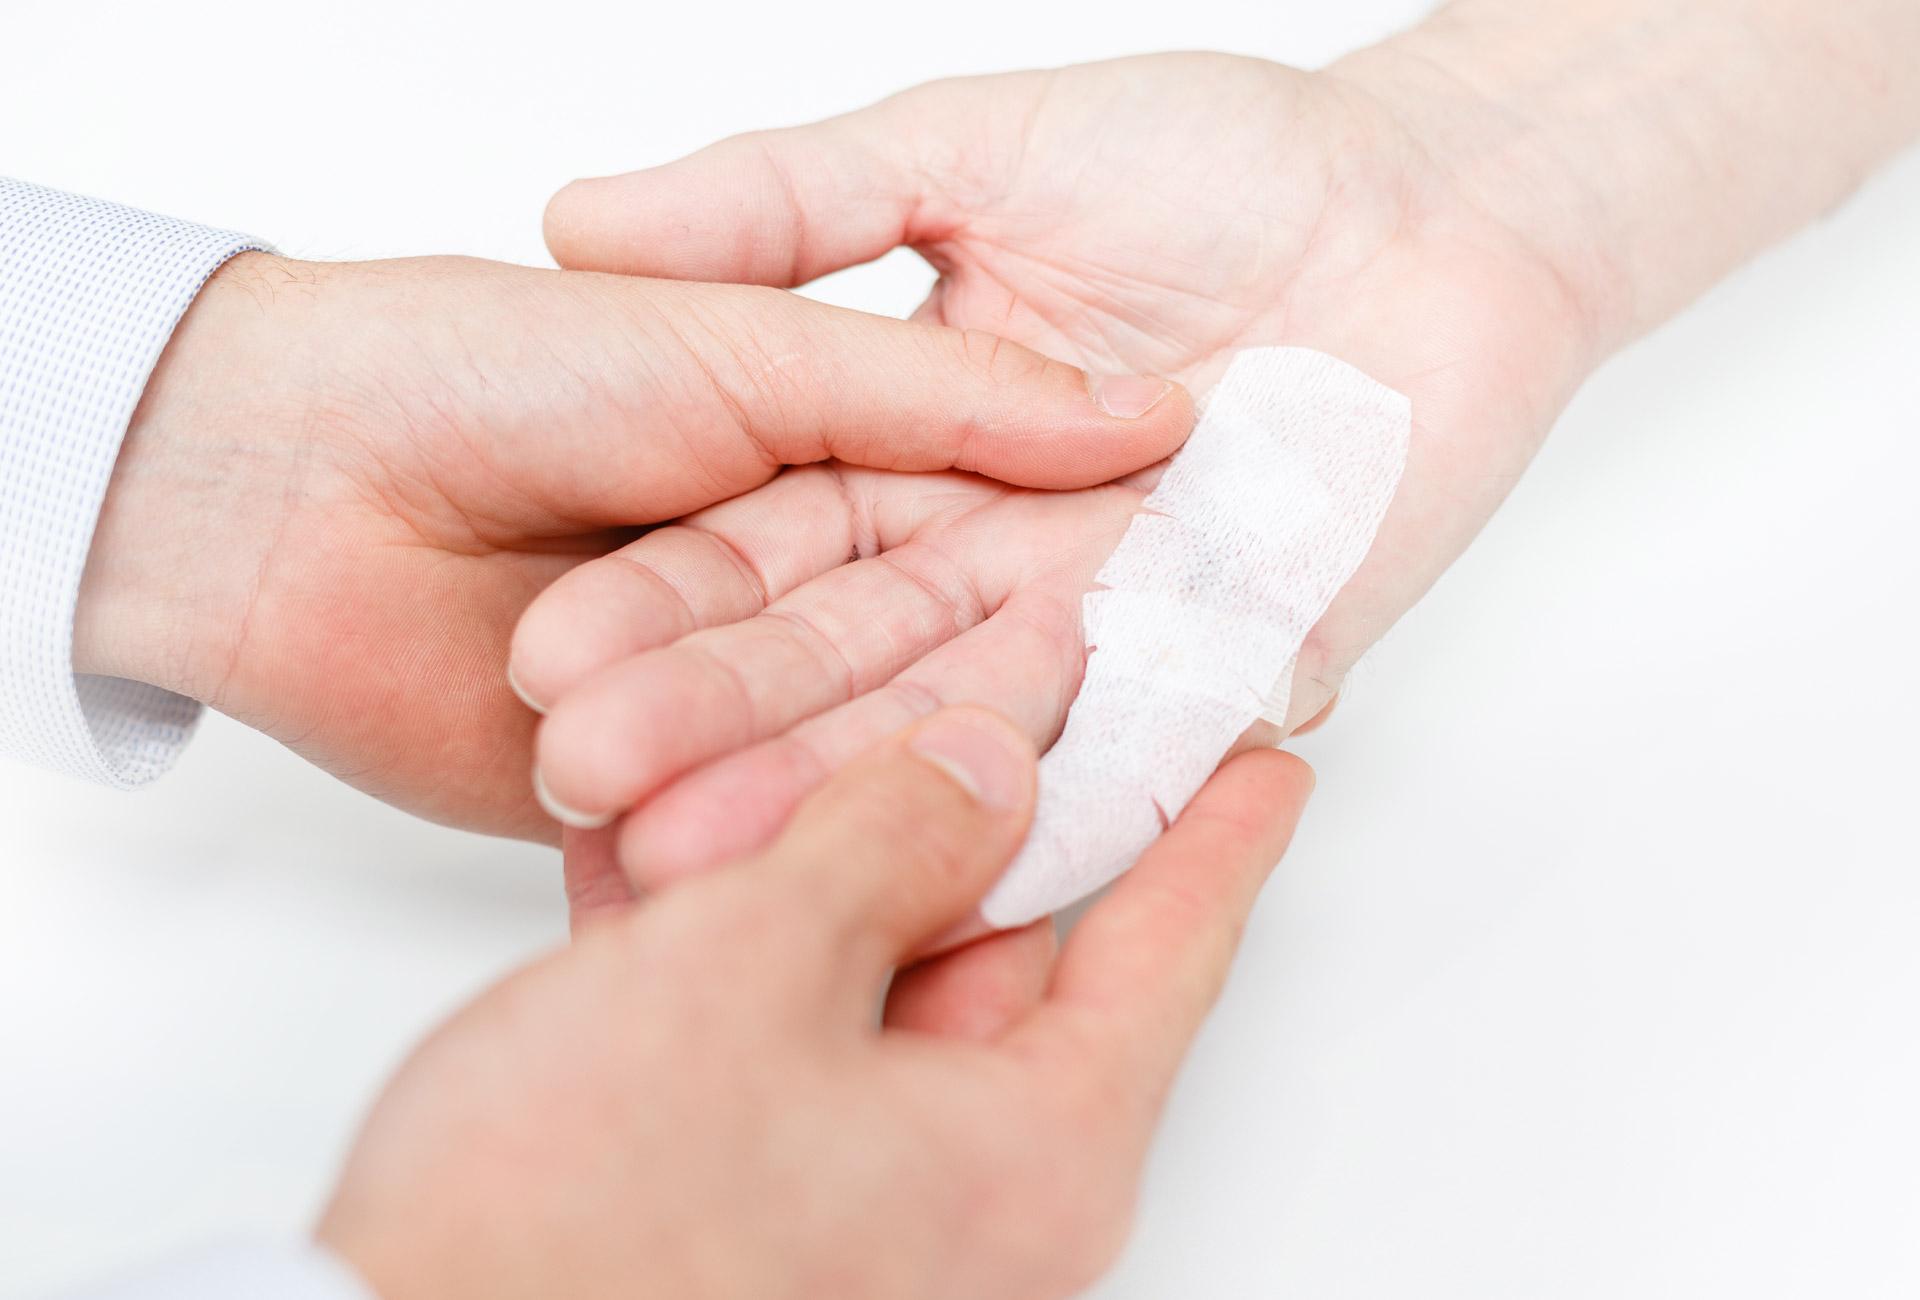 HTC Finger scar treatment